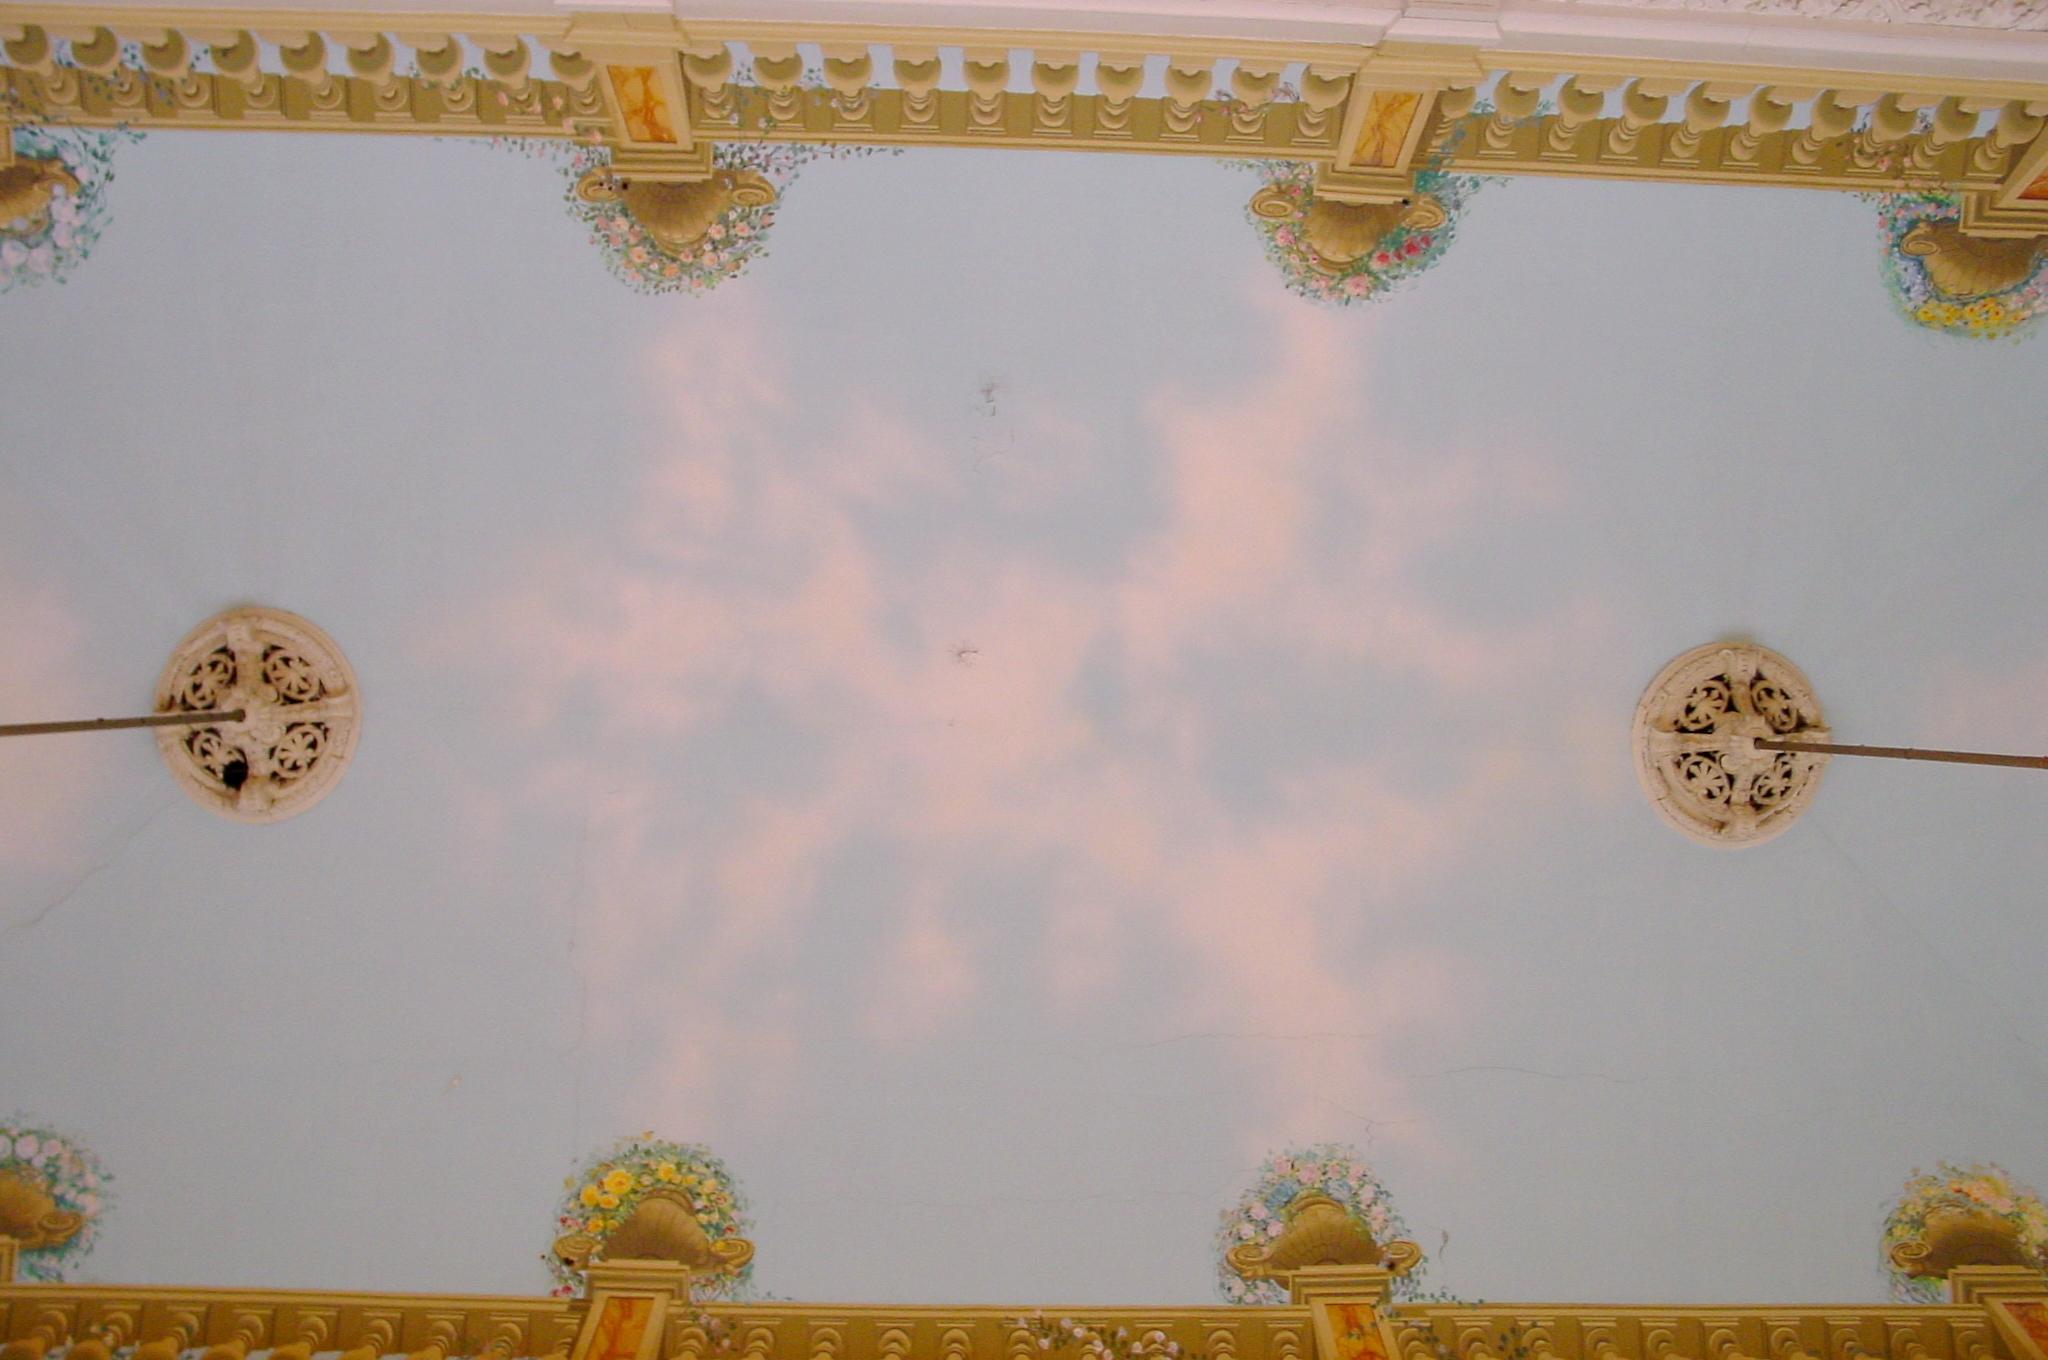 File plafond du salon napol on iii du palais des congr s de vichy allier france jpg - Plafond heeft de franse ...